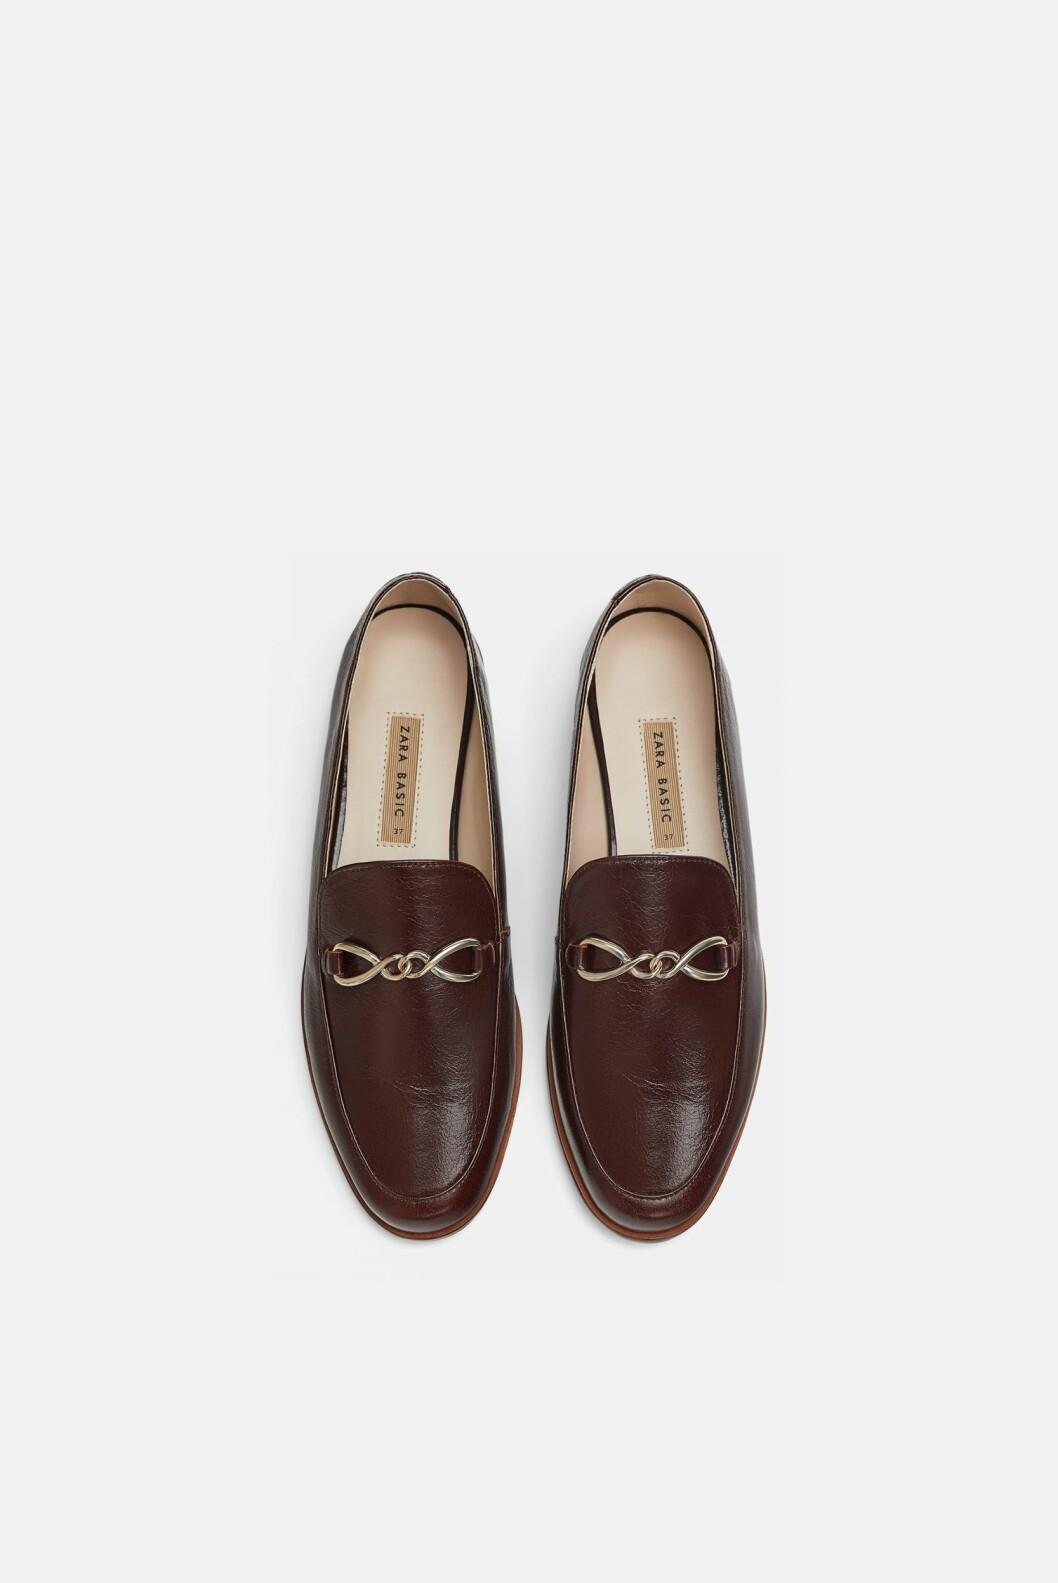 Sko fra Zara  600,-  https://www.zara.com/no/no/mokasin-i-skinn-p16922301.html?v1=6449830&v2=1074625